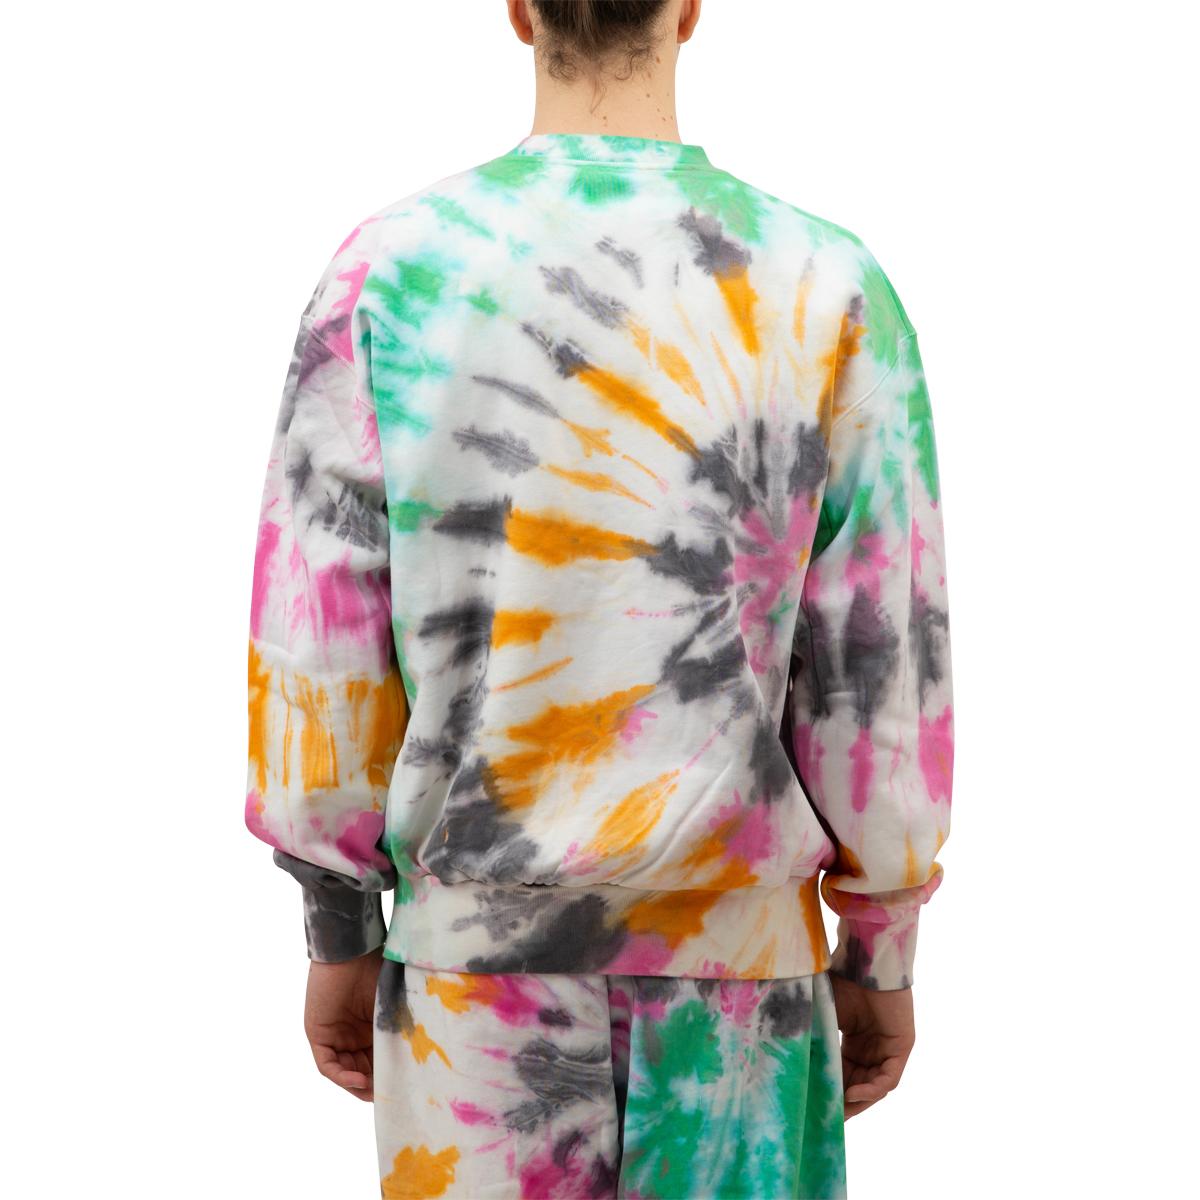 Aries No Problemo Sweatshirt Crusty